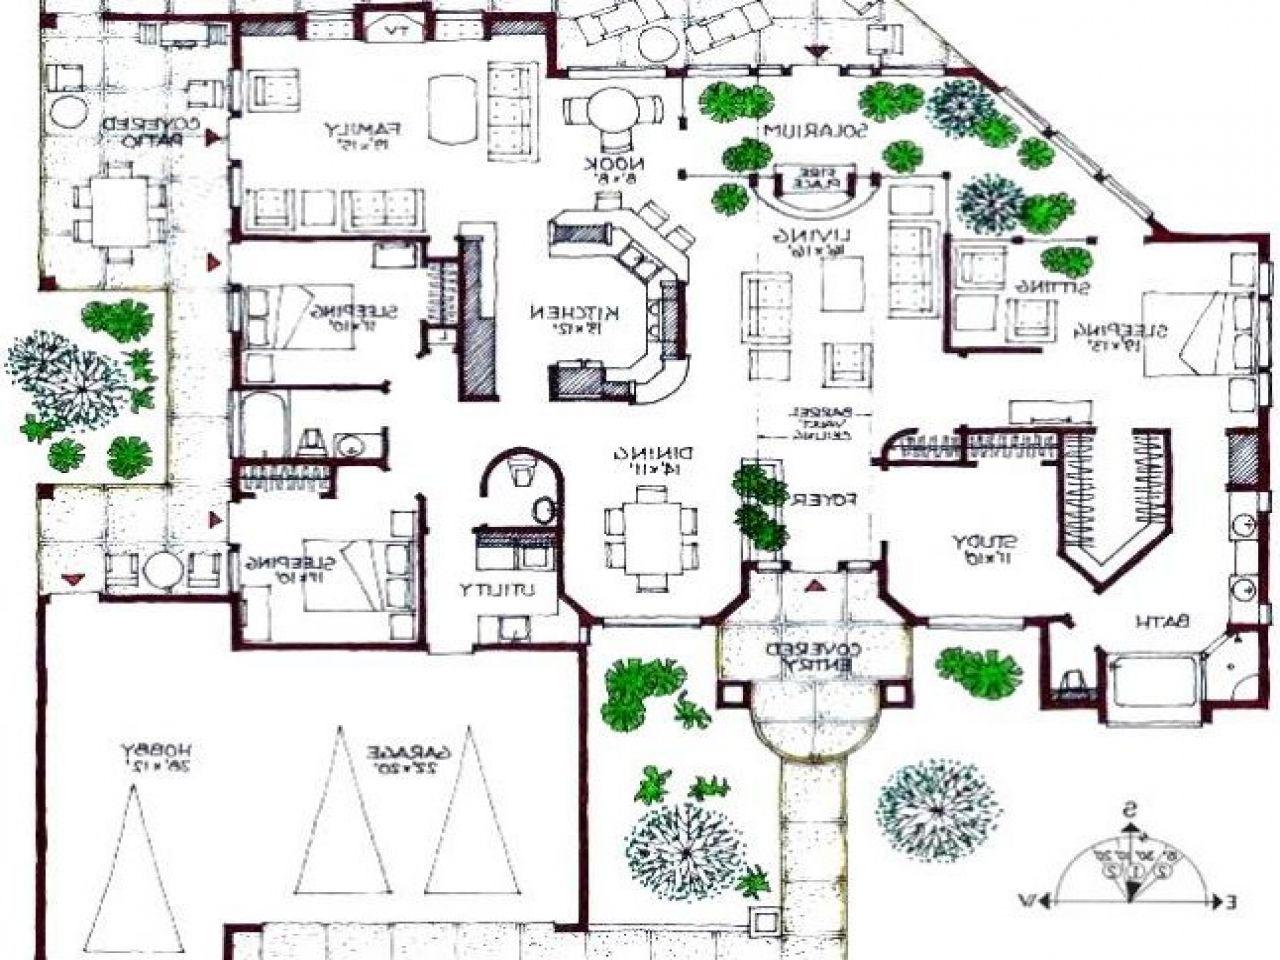 Modern Mansions Floor Plans Homes Floor Plans Modern House Floor Plans Solar House Plans House Floor Plans